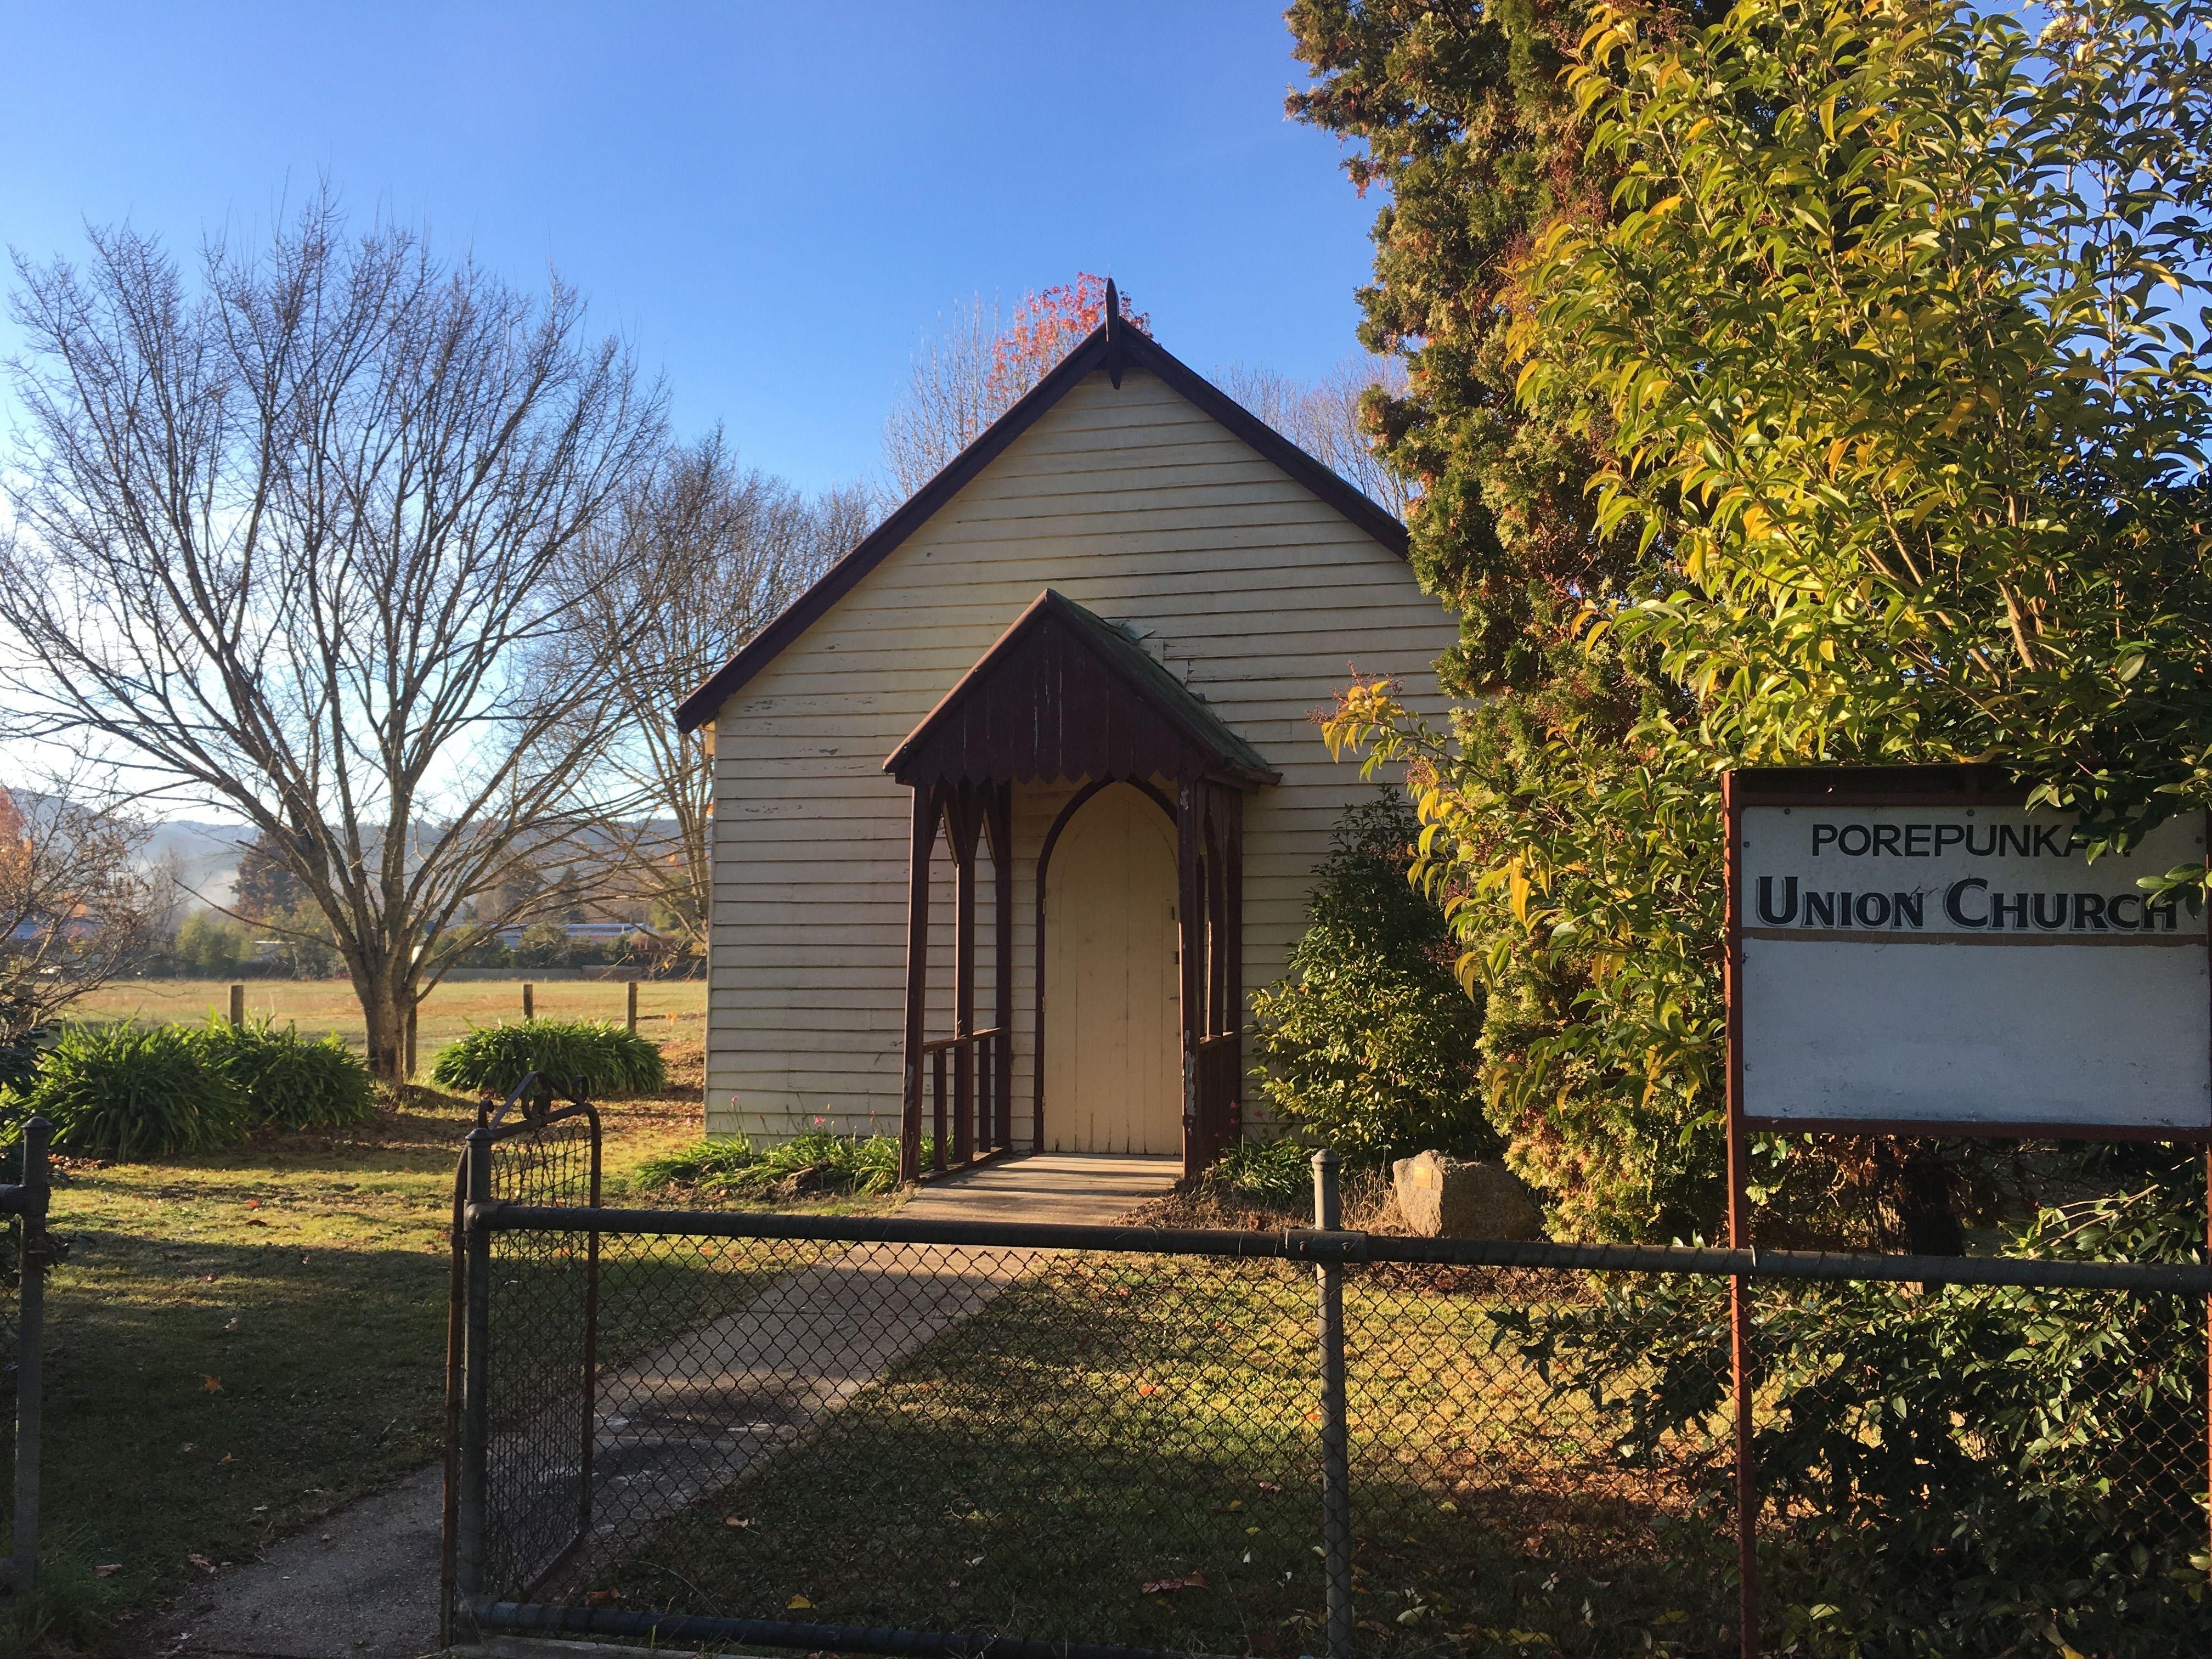 Porepunkah Union Church